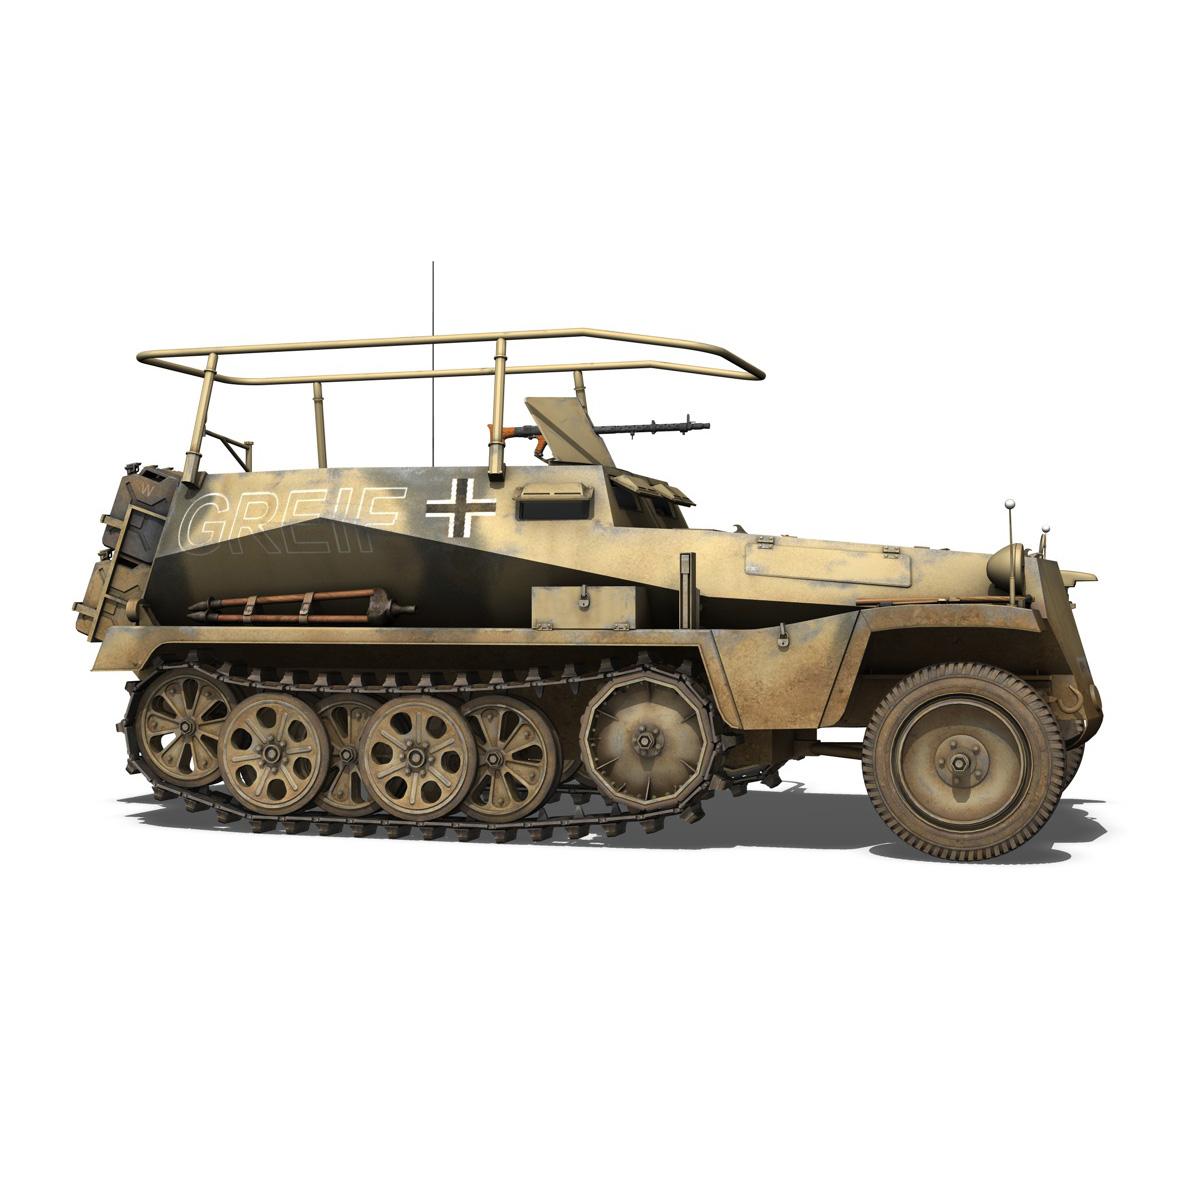 sd.kfz 250/3 – greif – half-track command variant 3d model 3ds fbx c4d lwo obj 197592